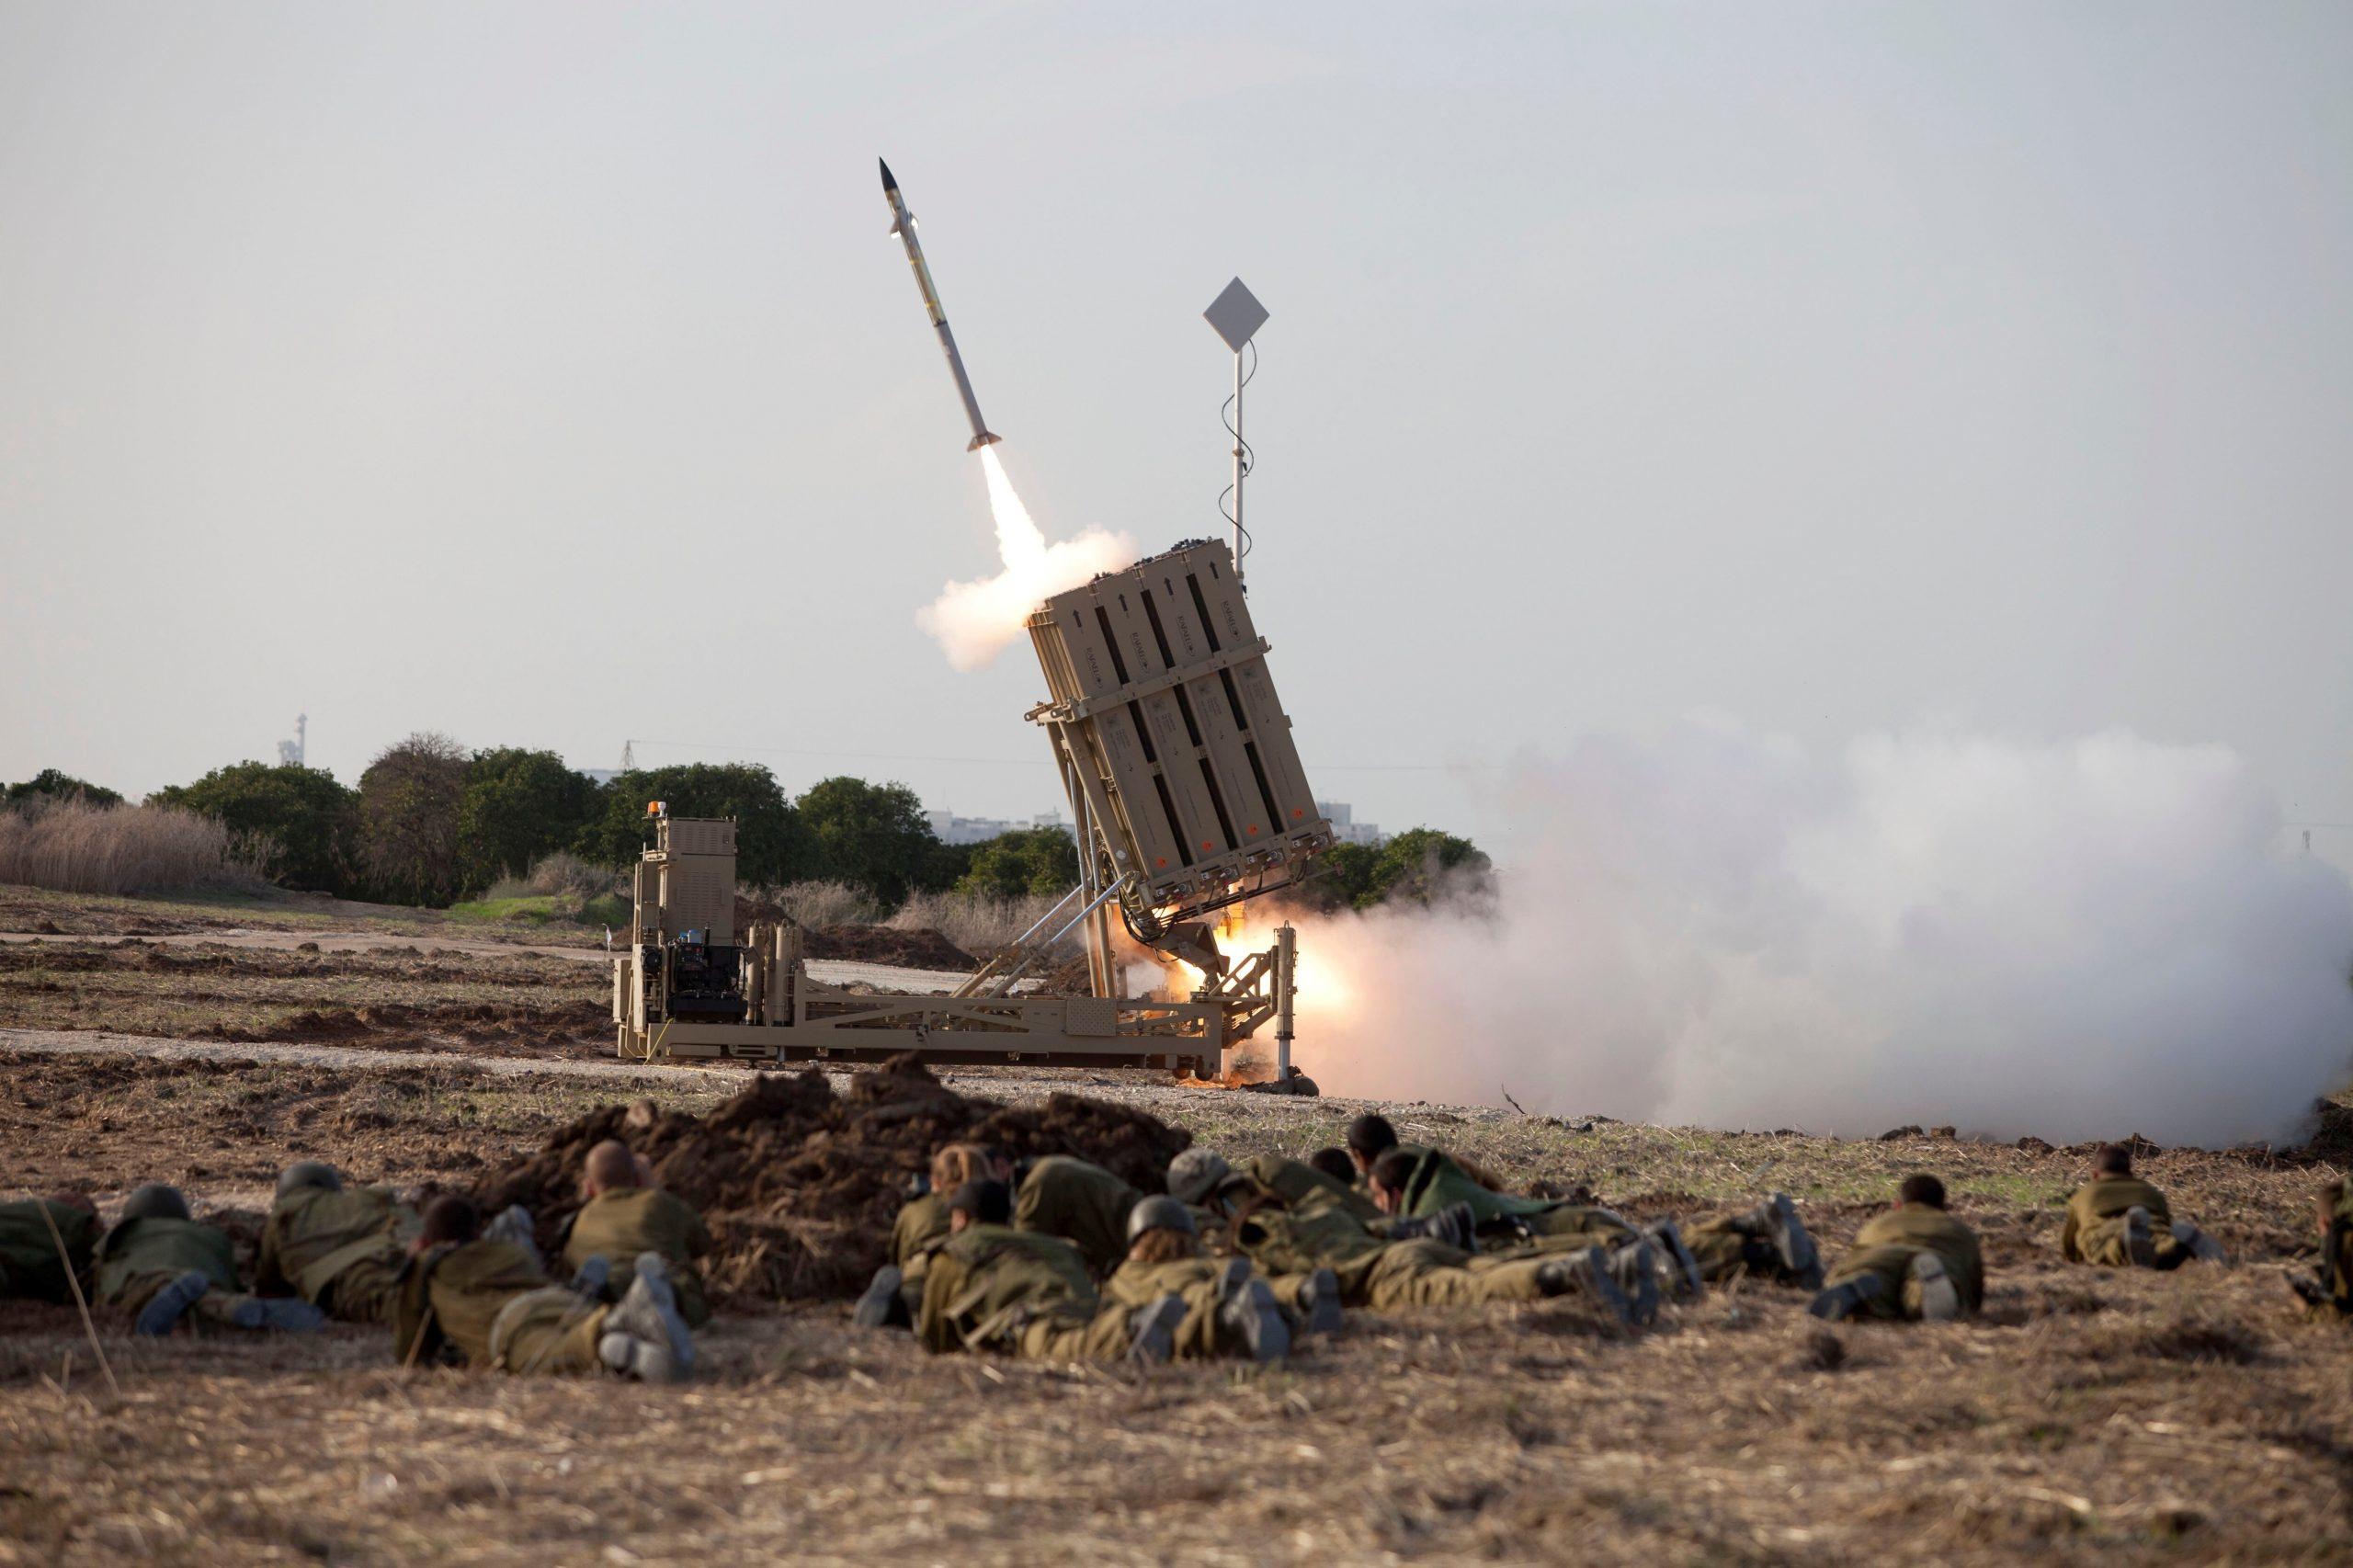 Israel and Gaza exchanged missile strikes